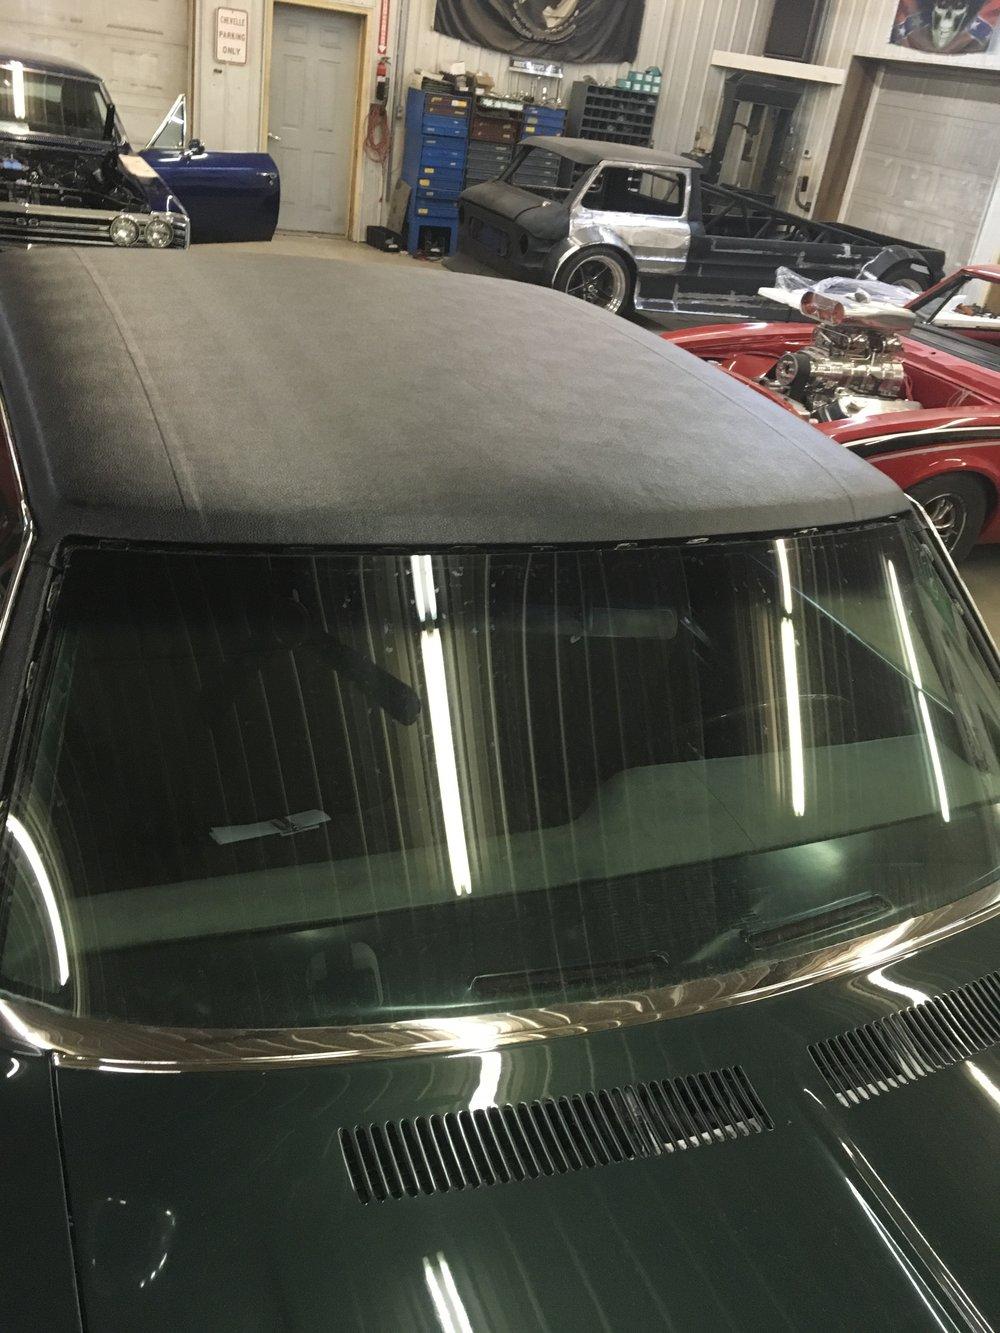 1970-impala-minneapolis-car-restoration-hot-rod-factory-new-paint-exterior-body-work.jpg